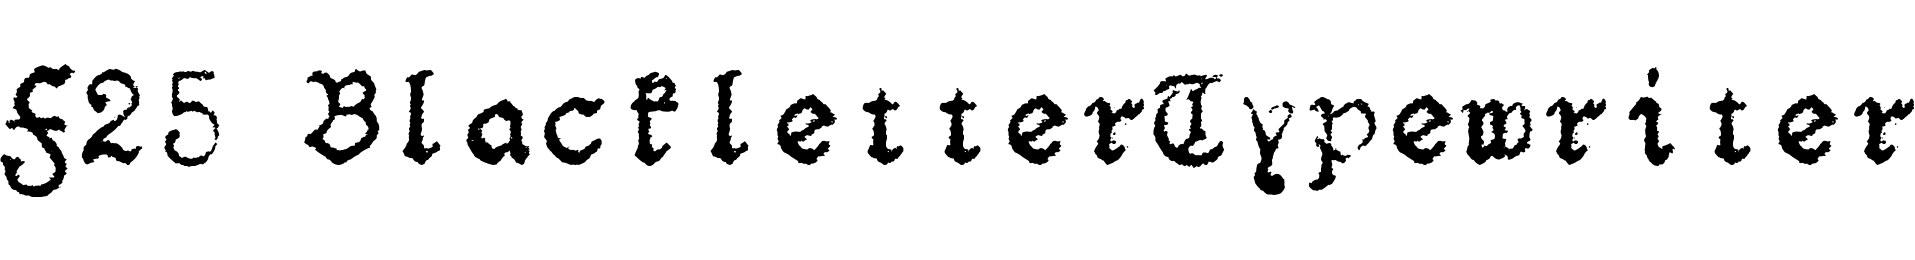 F25 BlackletterTypewriter